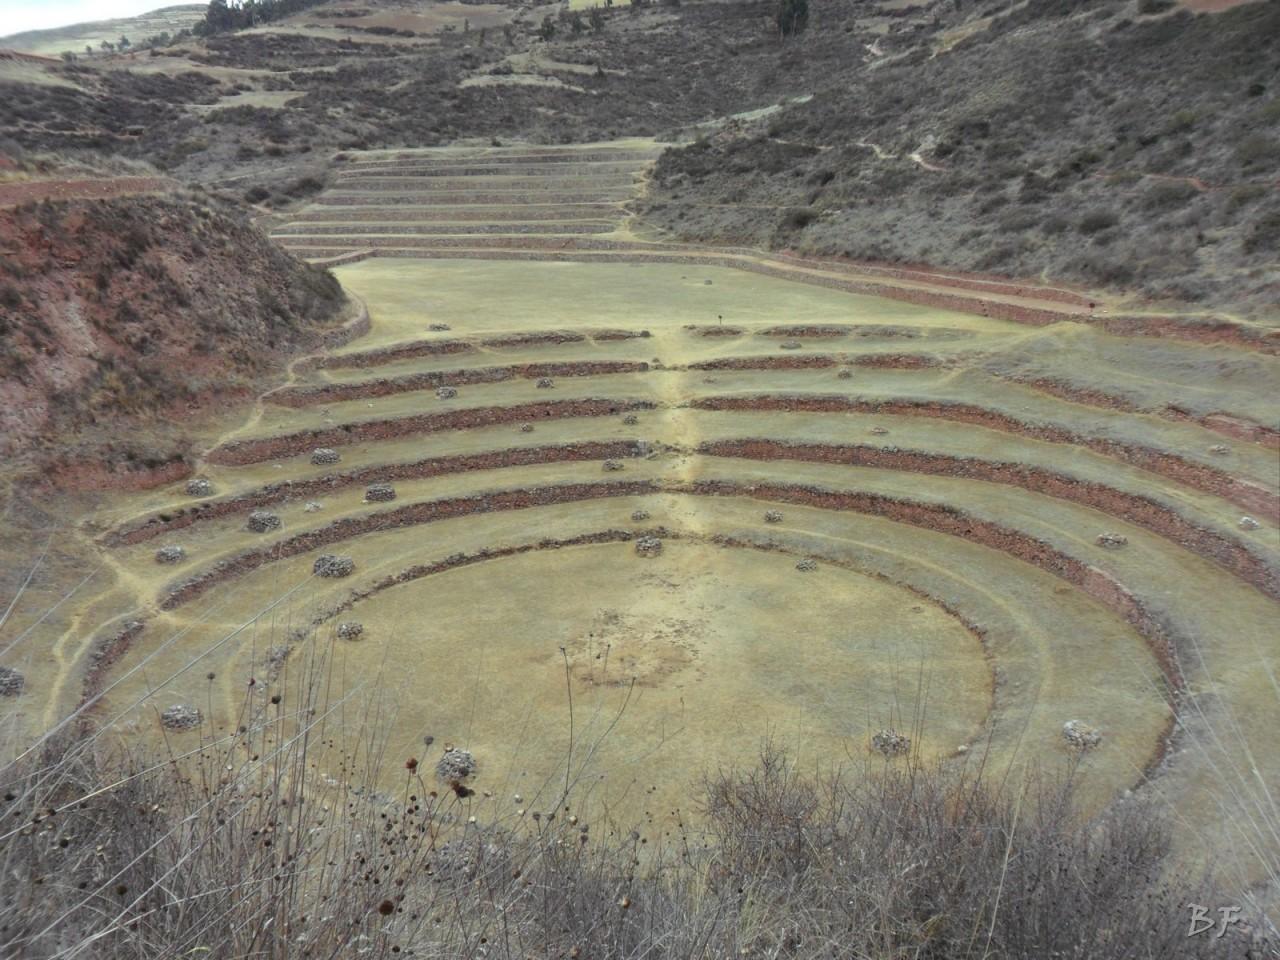 Terrazze-Circolari-Megaliti-Moray-Saline-Maras-Cusco-Perù-18